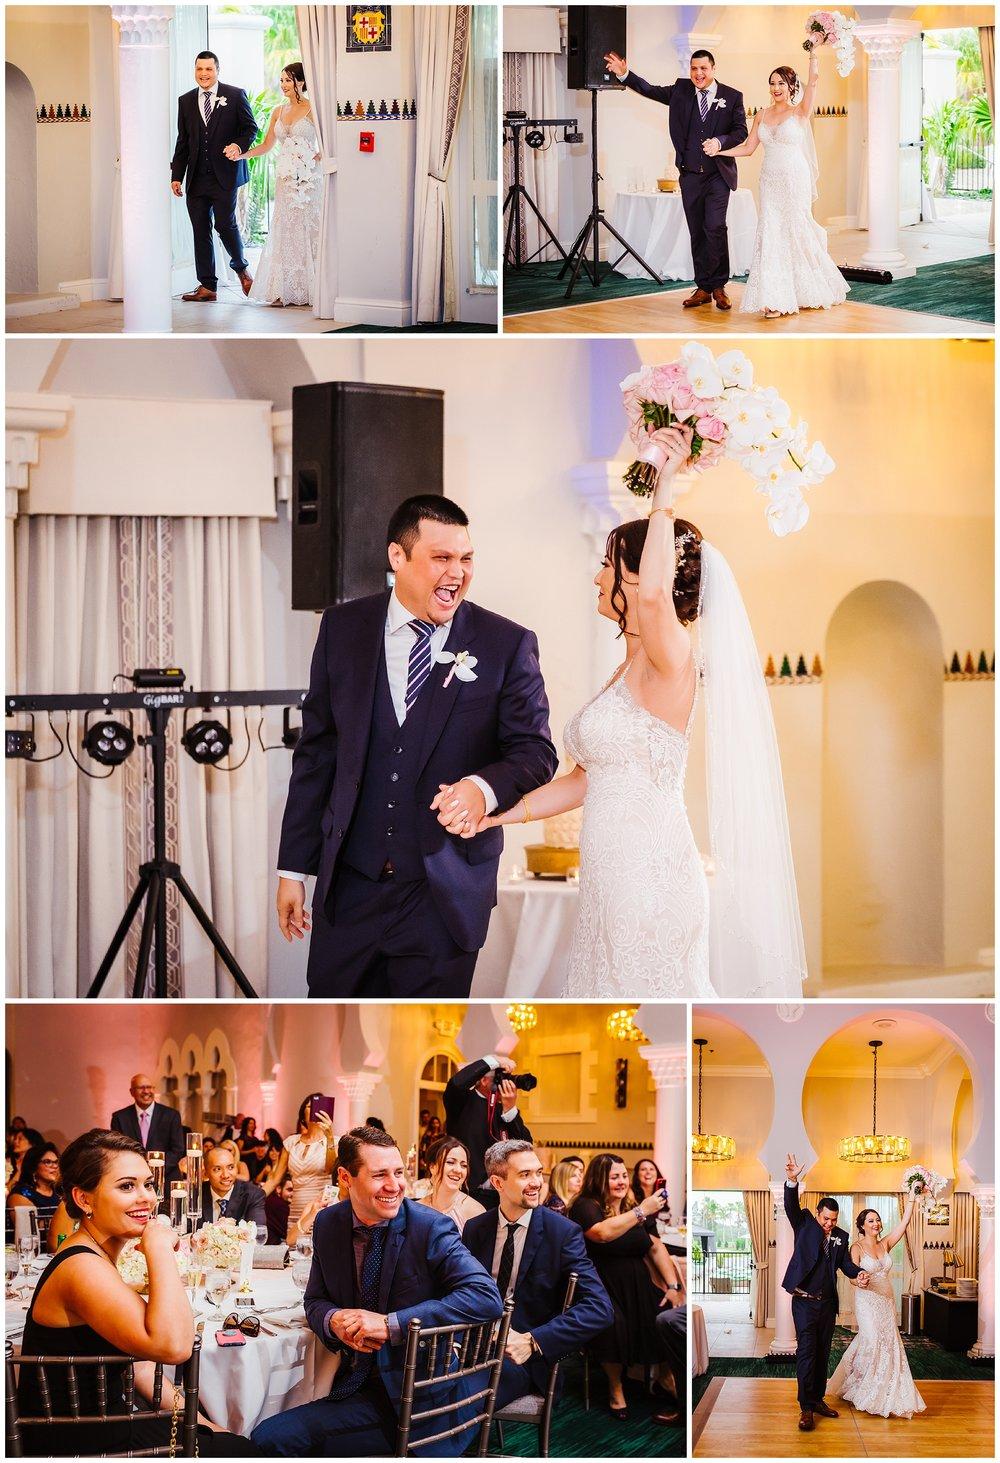 vinoy-sunset-ballroom-rainy-day-wedding-photography-orchids-trinidad-flawless-fetes-ashlee-hamon_0148.jpg